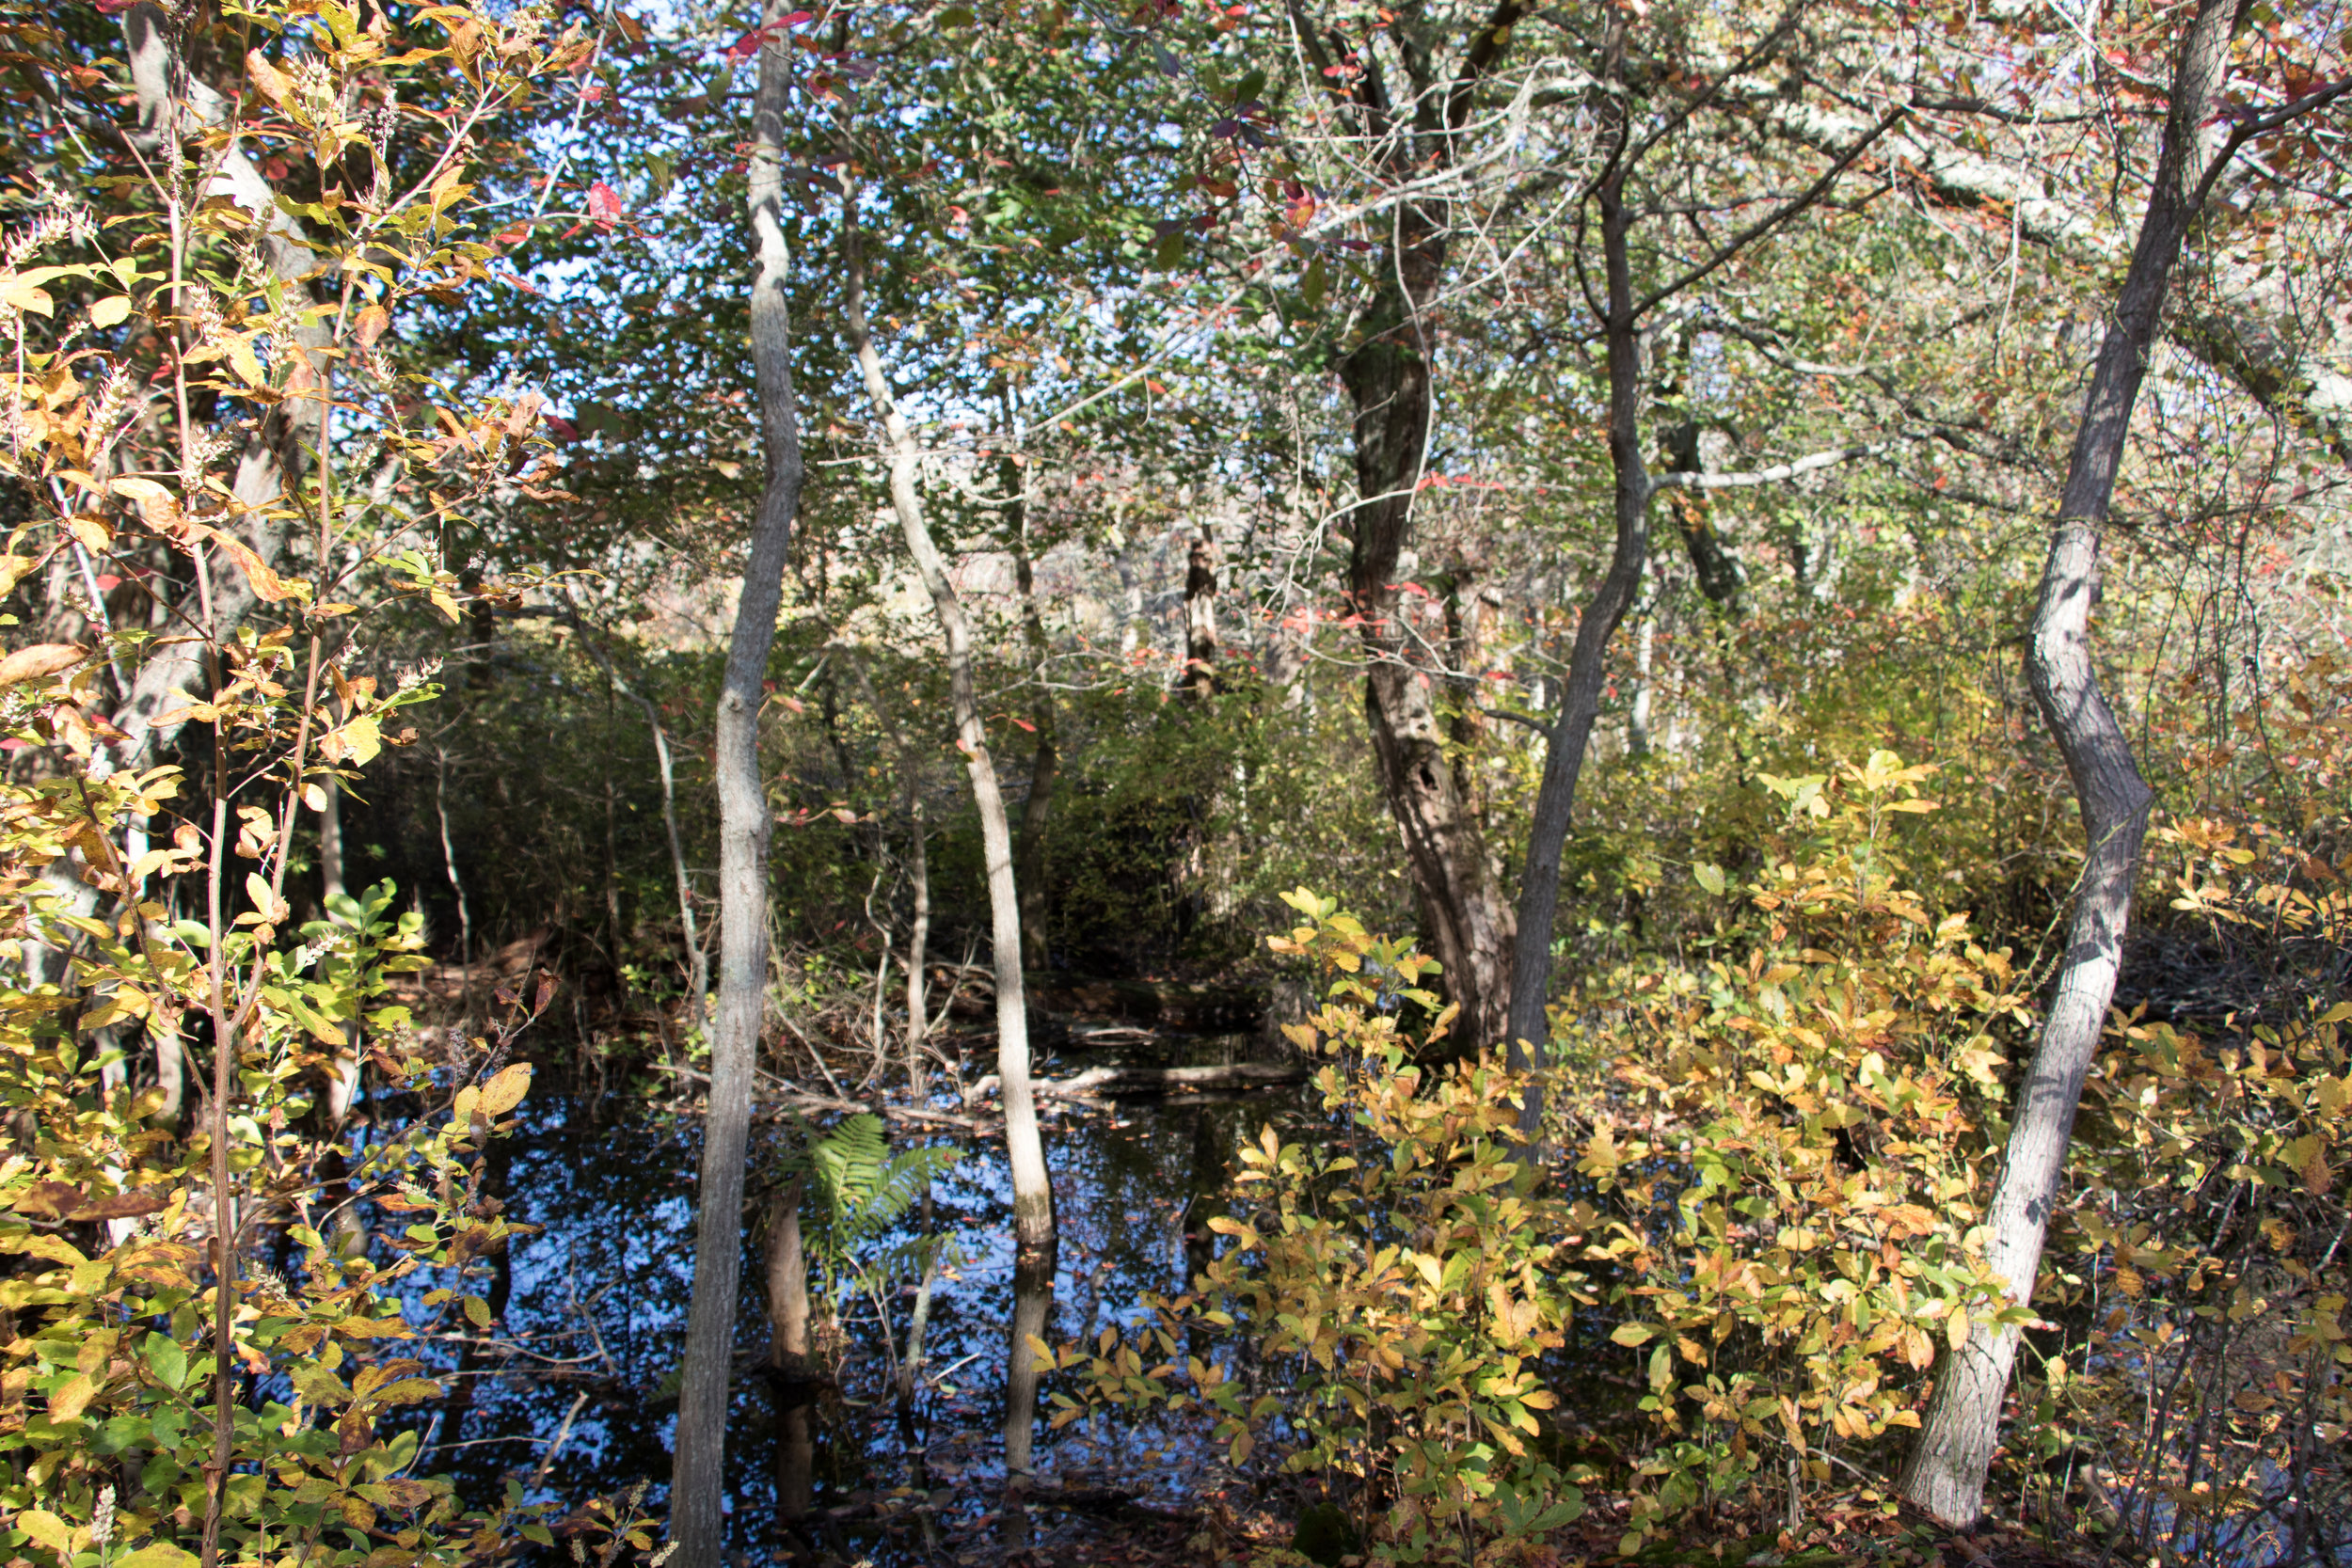 Red Maple Swamp, Cape Cod. Photo Credit: Liz Summit, 2017